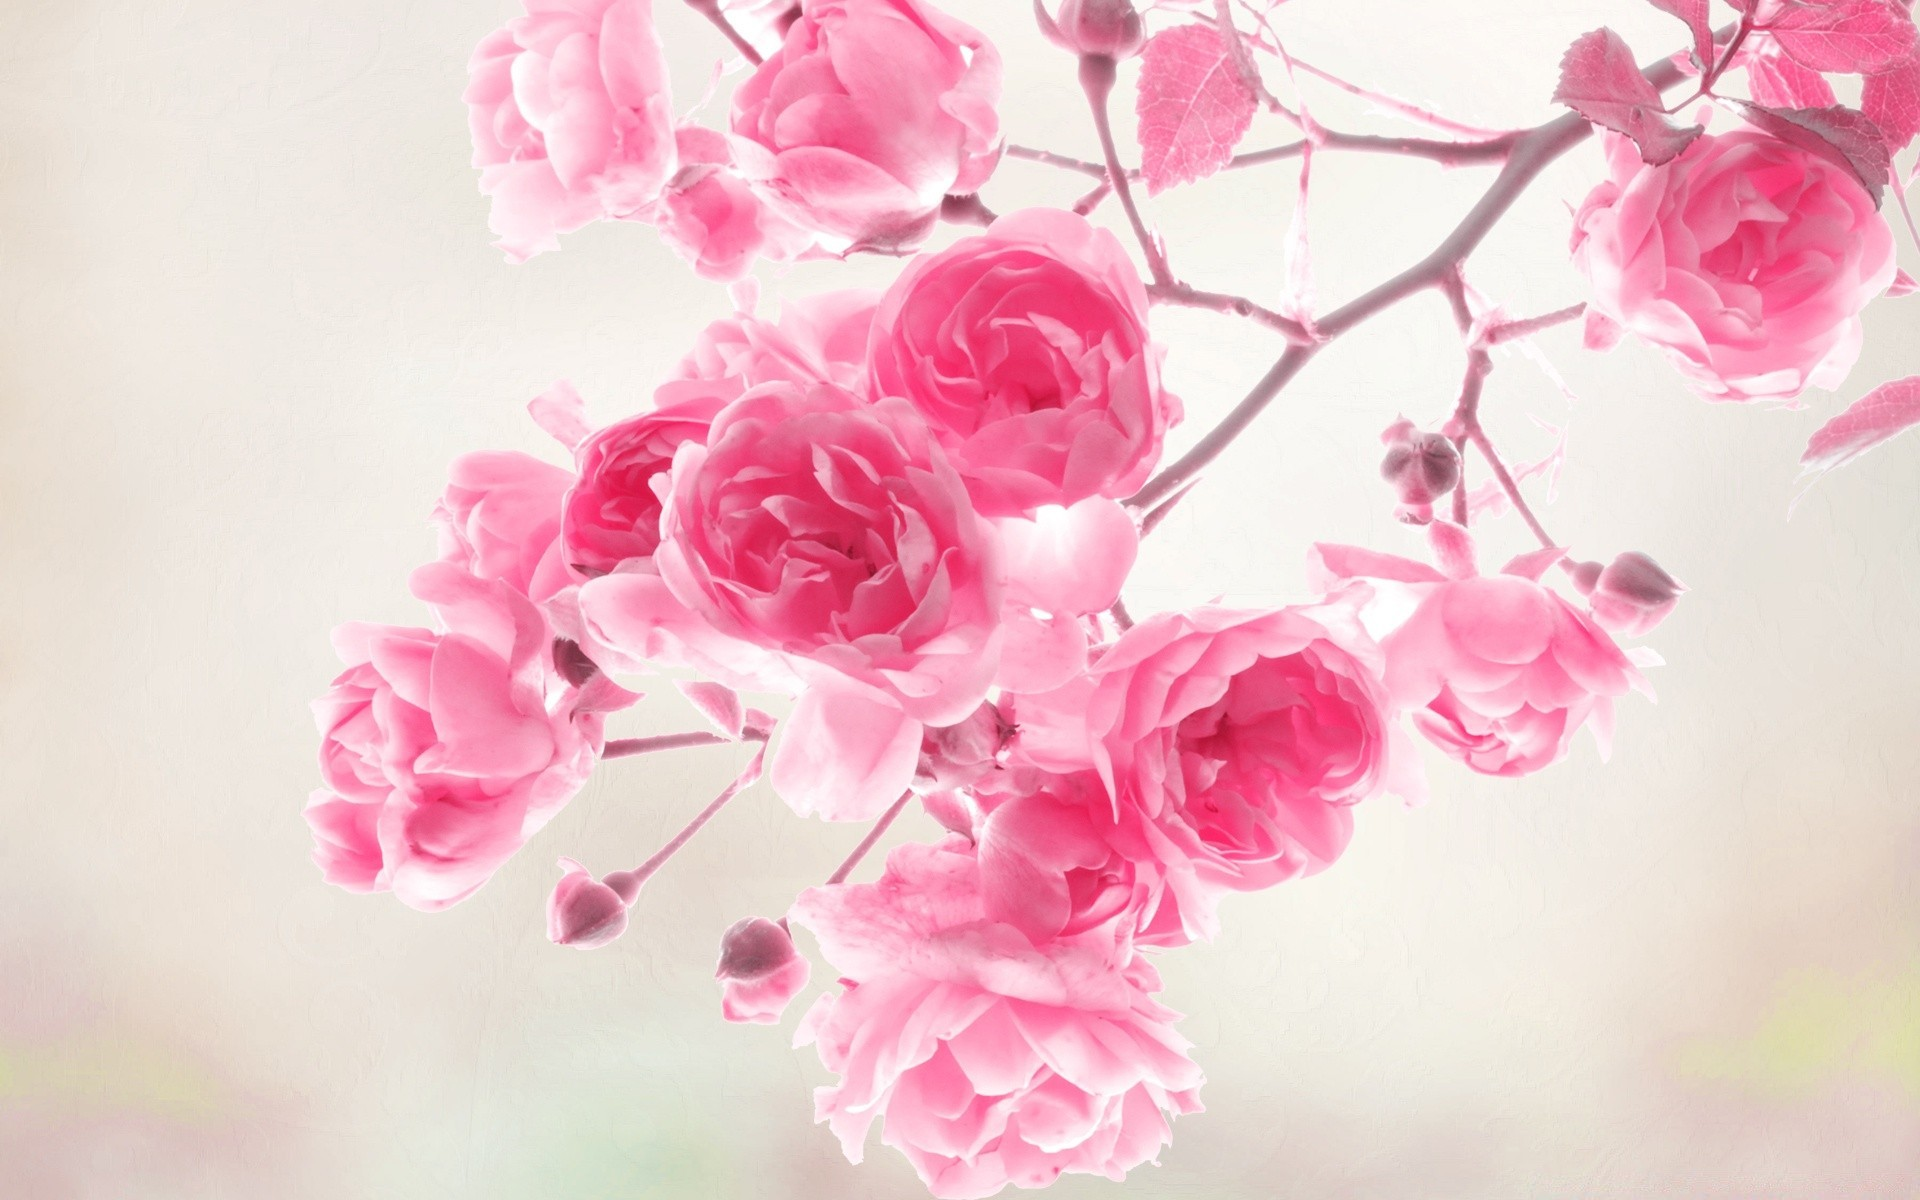 цветок розовый без смс